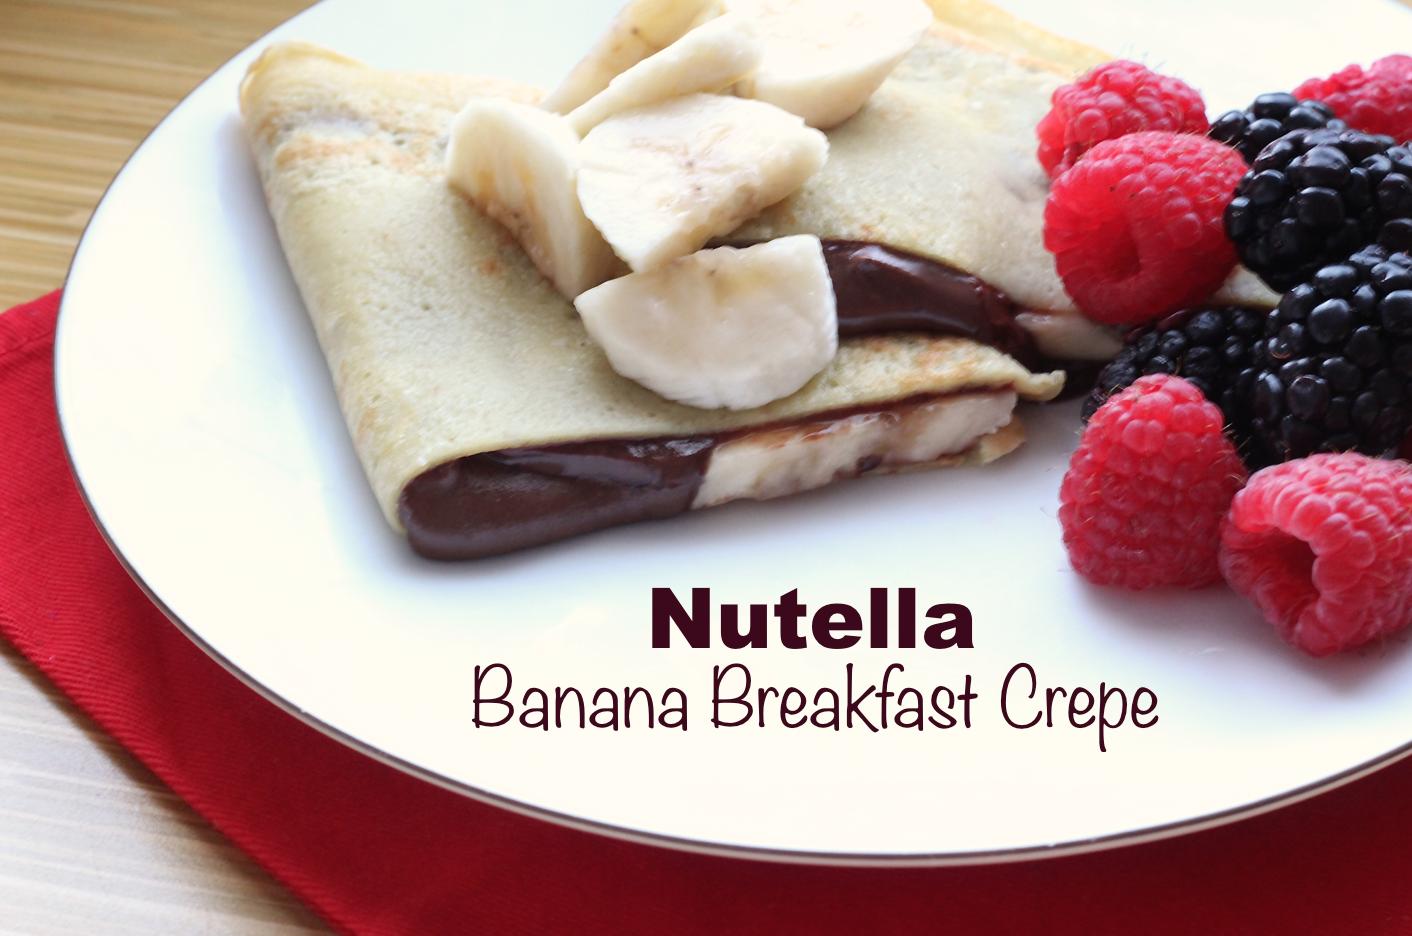 Add a Little Joy with a Nutella Banana Breakfast Crepe